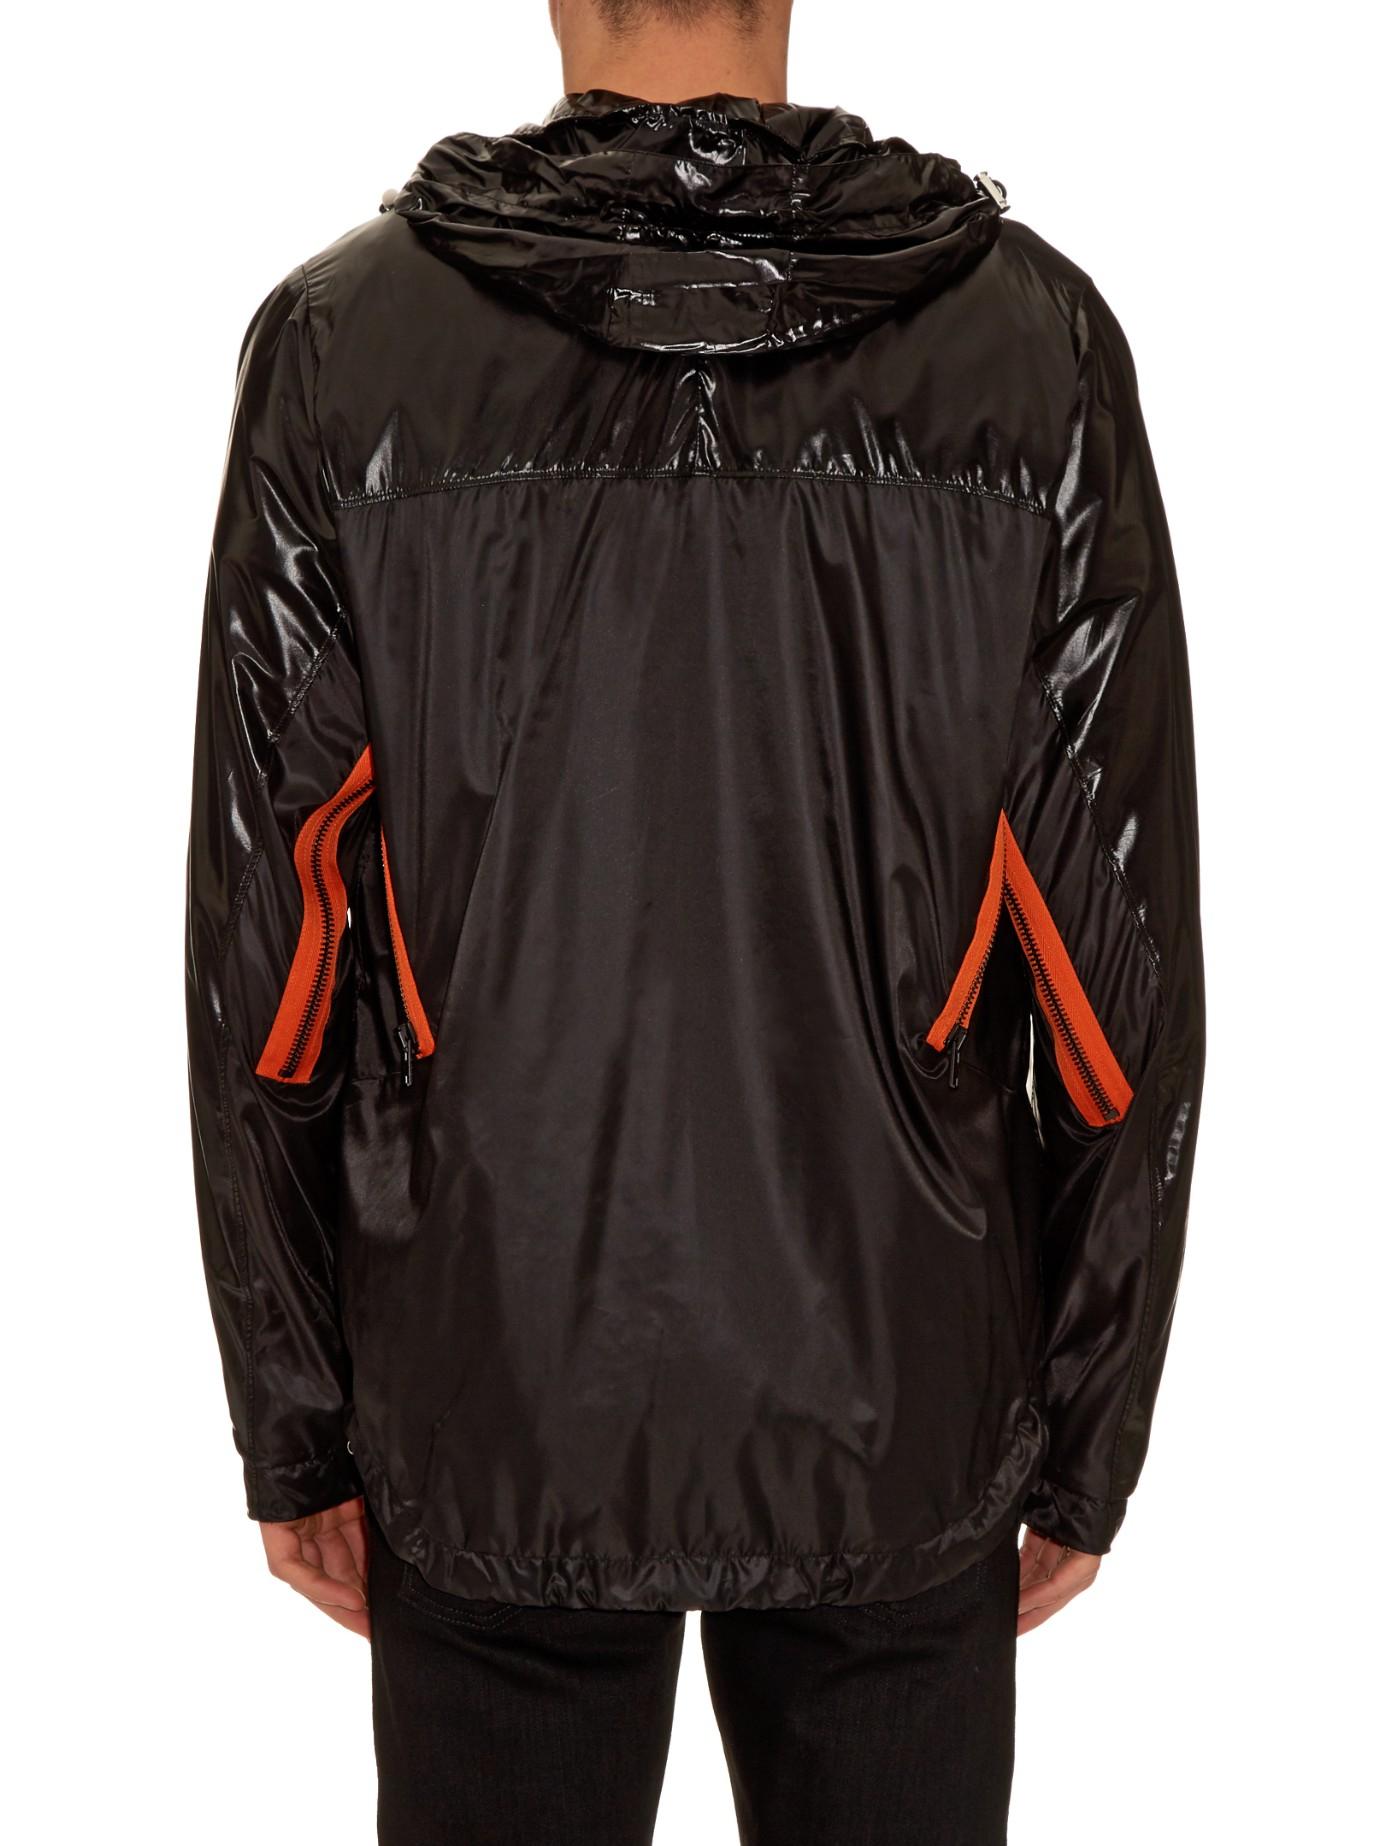 Givenchy Windbreaker Nylon Jacket in Black for Men   Lyst